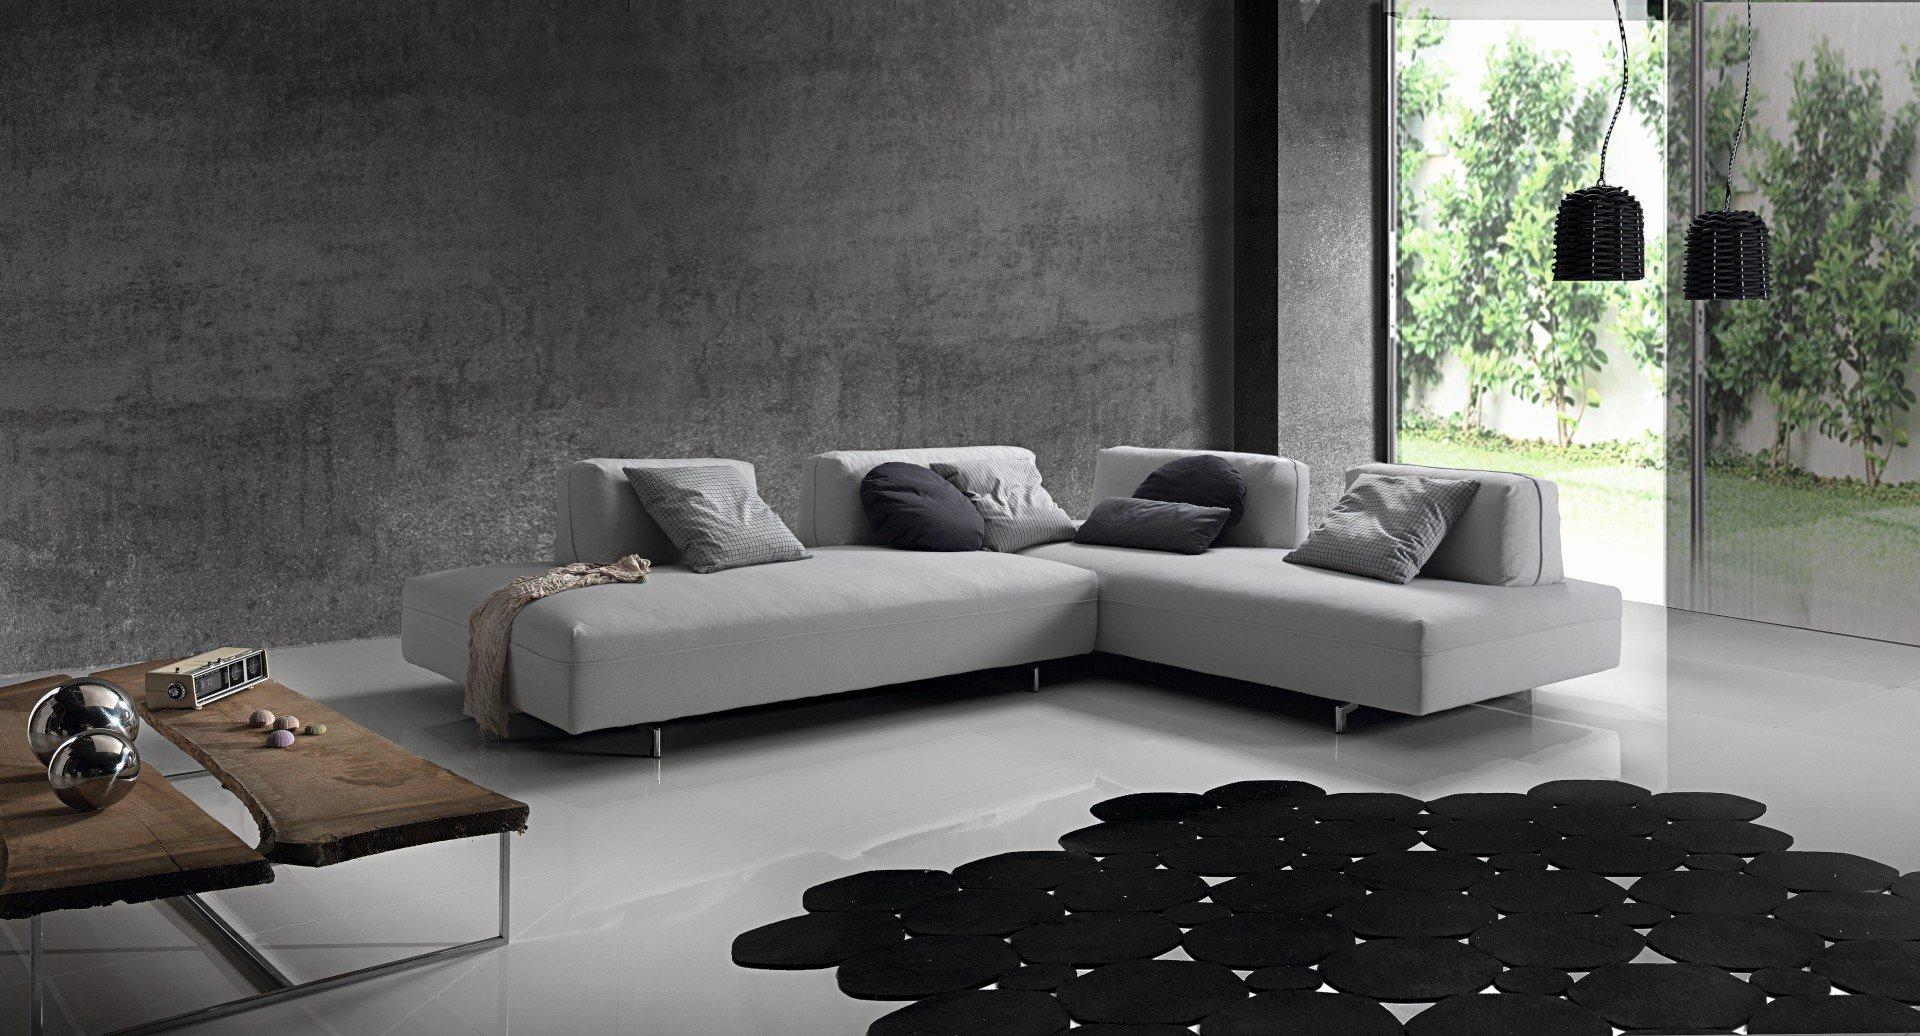 sofa modello urban